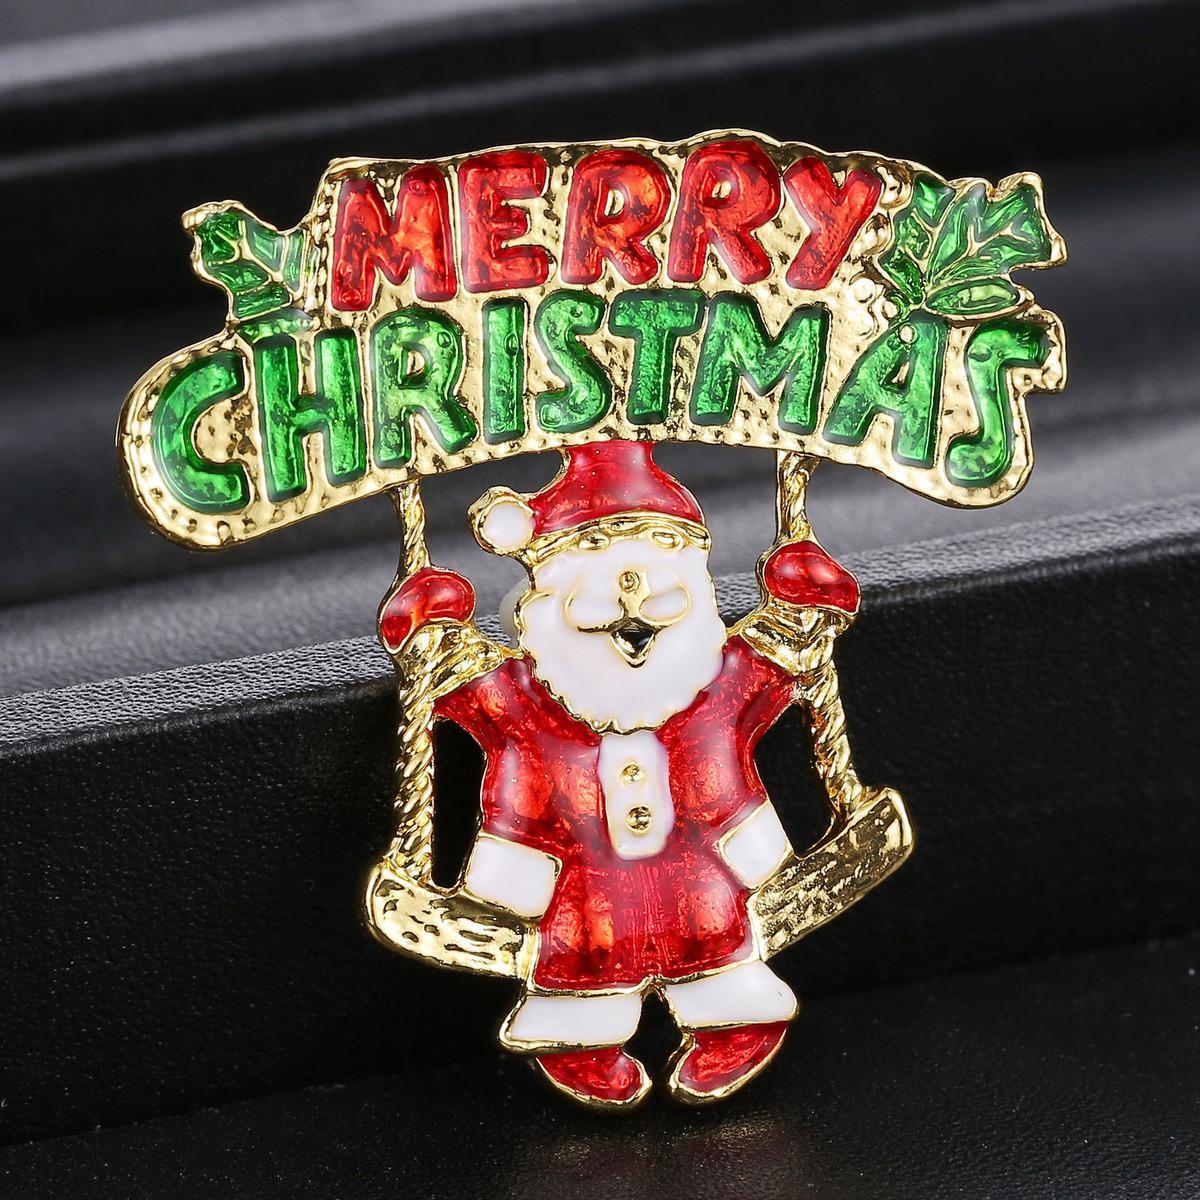 12 style émail bonhomme de neige santa tree broche broche cadeaux de noël jingle bell bottes broches charme cristal cadeau de noël